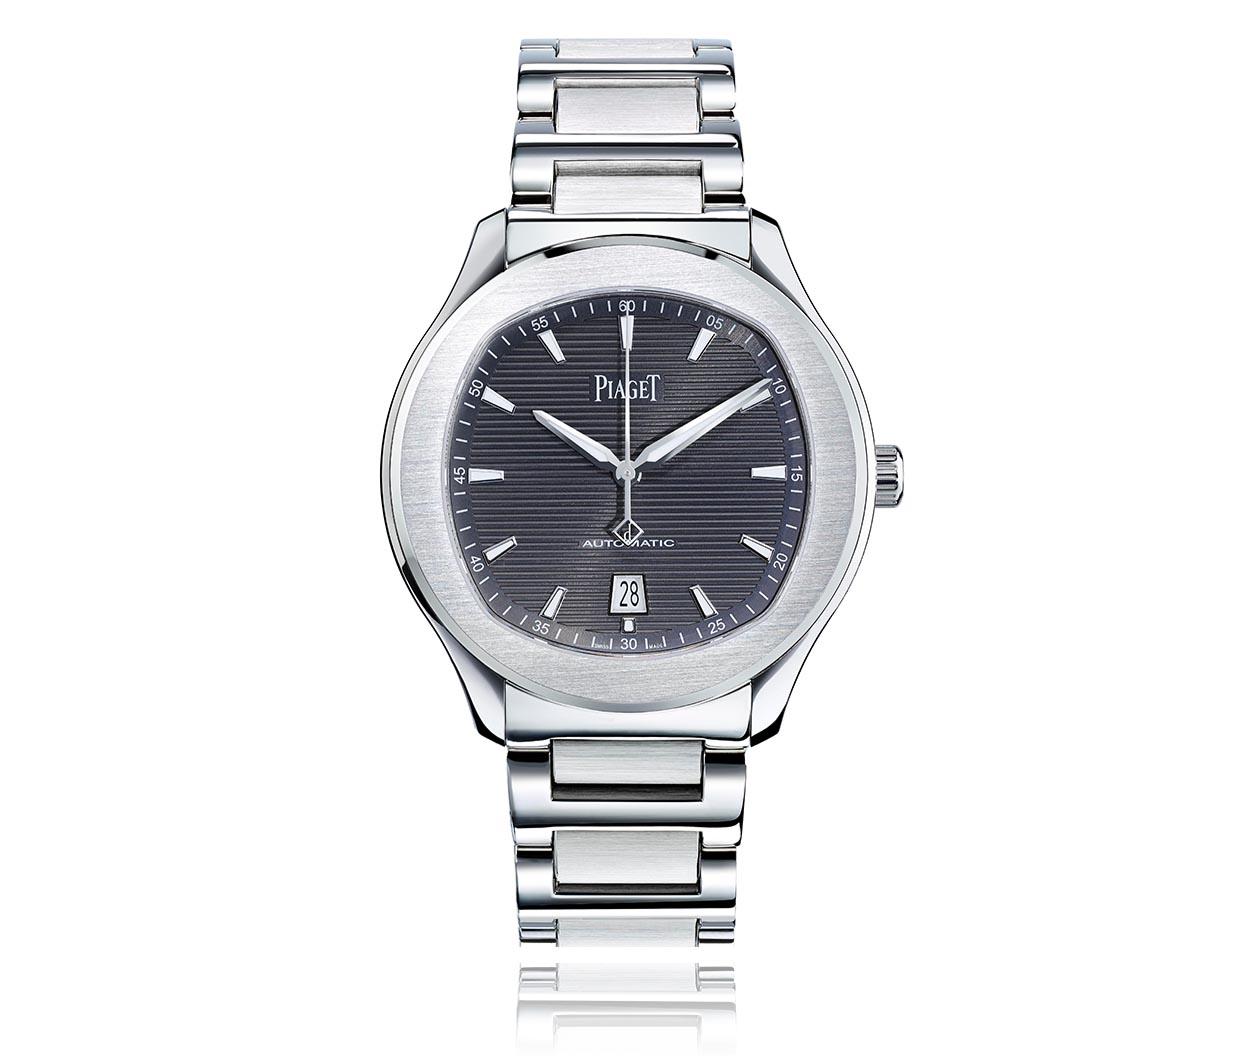 Piaget PoloS watch G0A41003 Carousel 1 FINAL